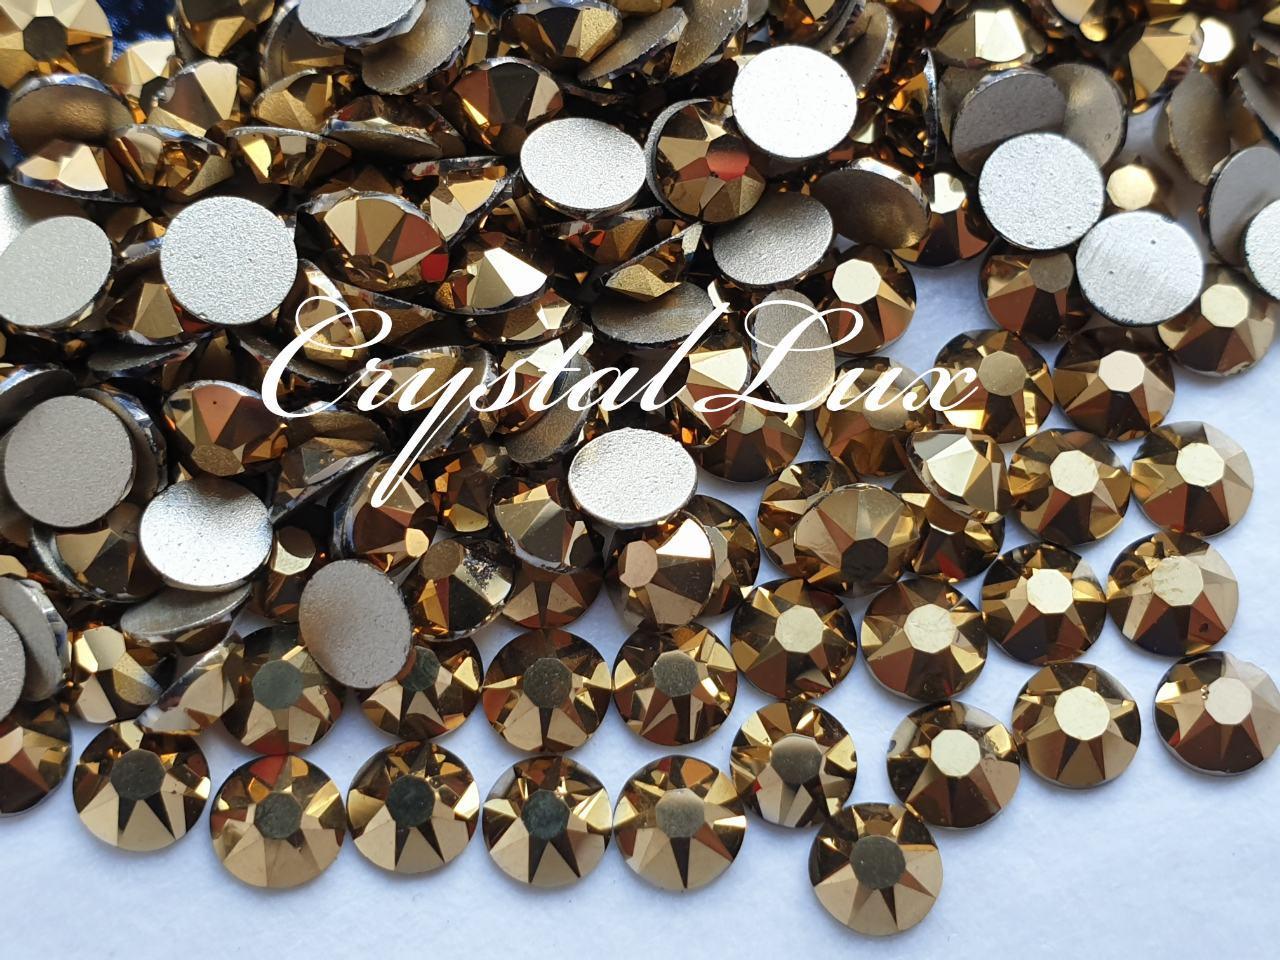 Стразы ss16 Mine Gold Xirius, NEW, 16 граней, 100шт. (4,0мм)